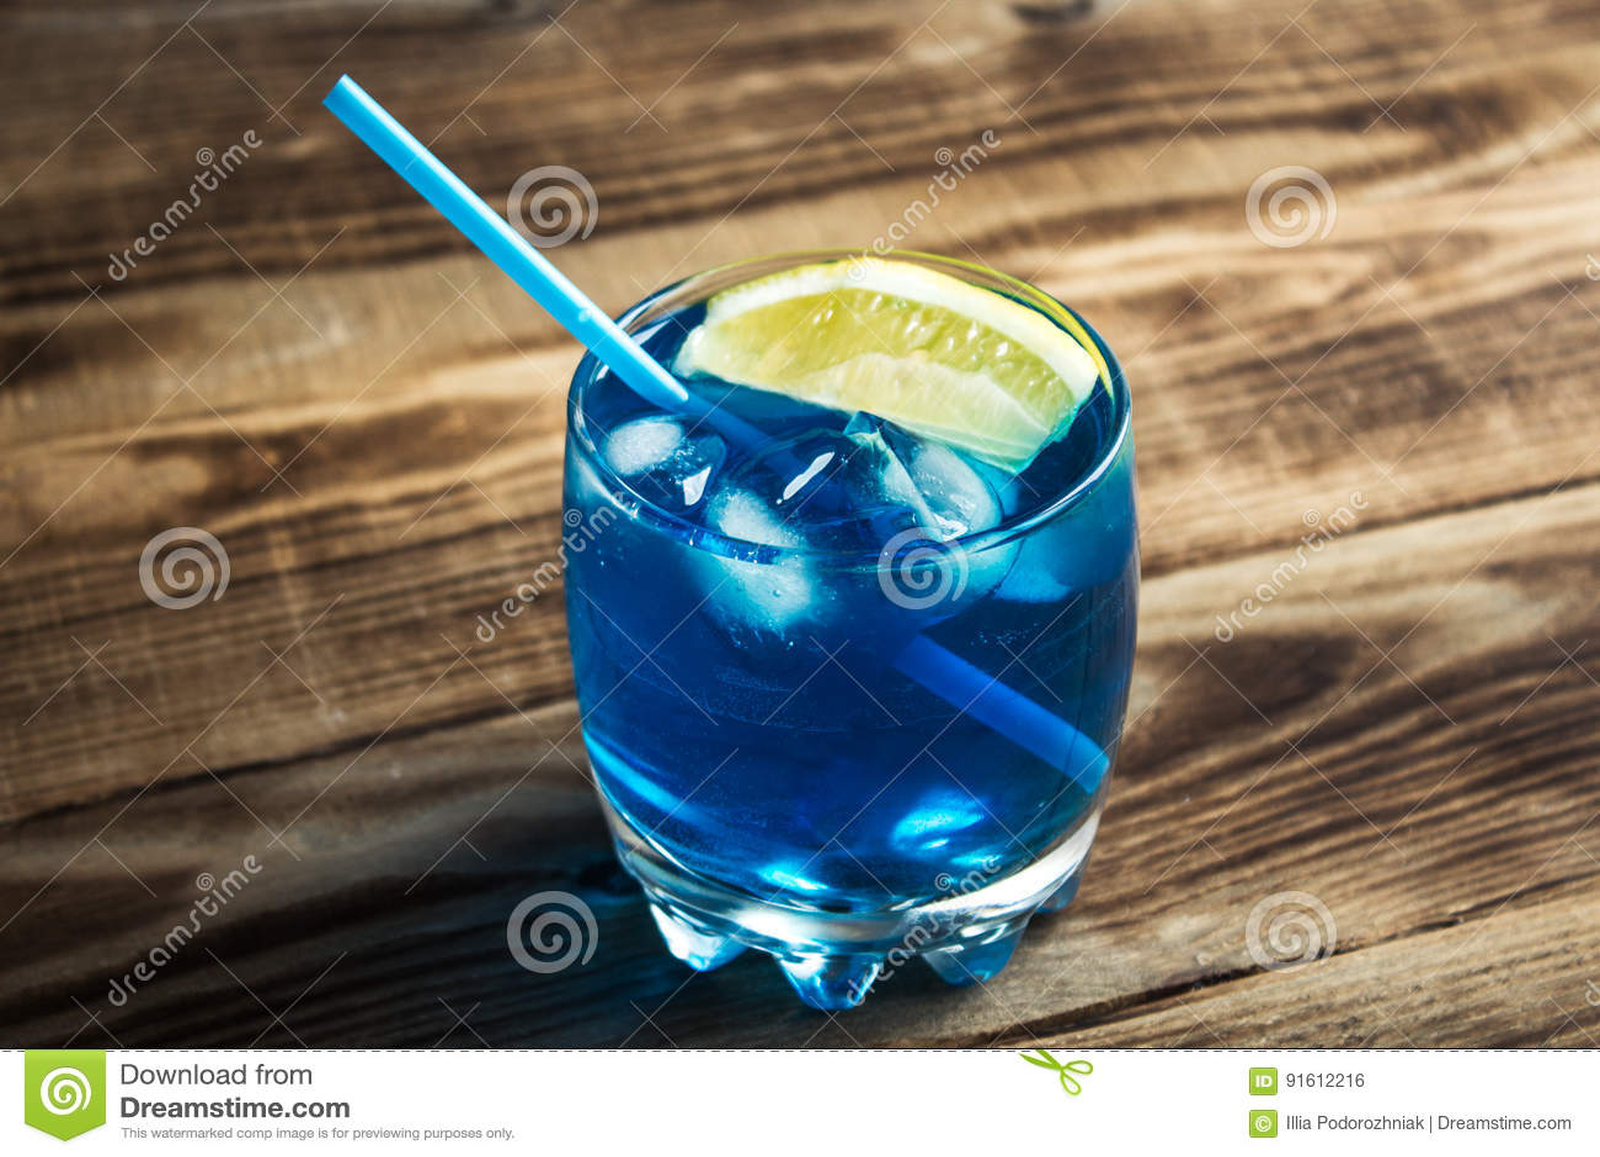 Lichtblauwe alcoholische drankcuracao likeur